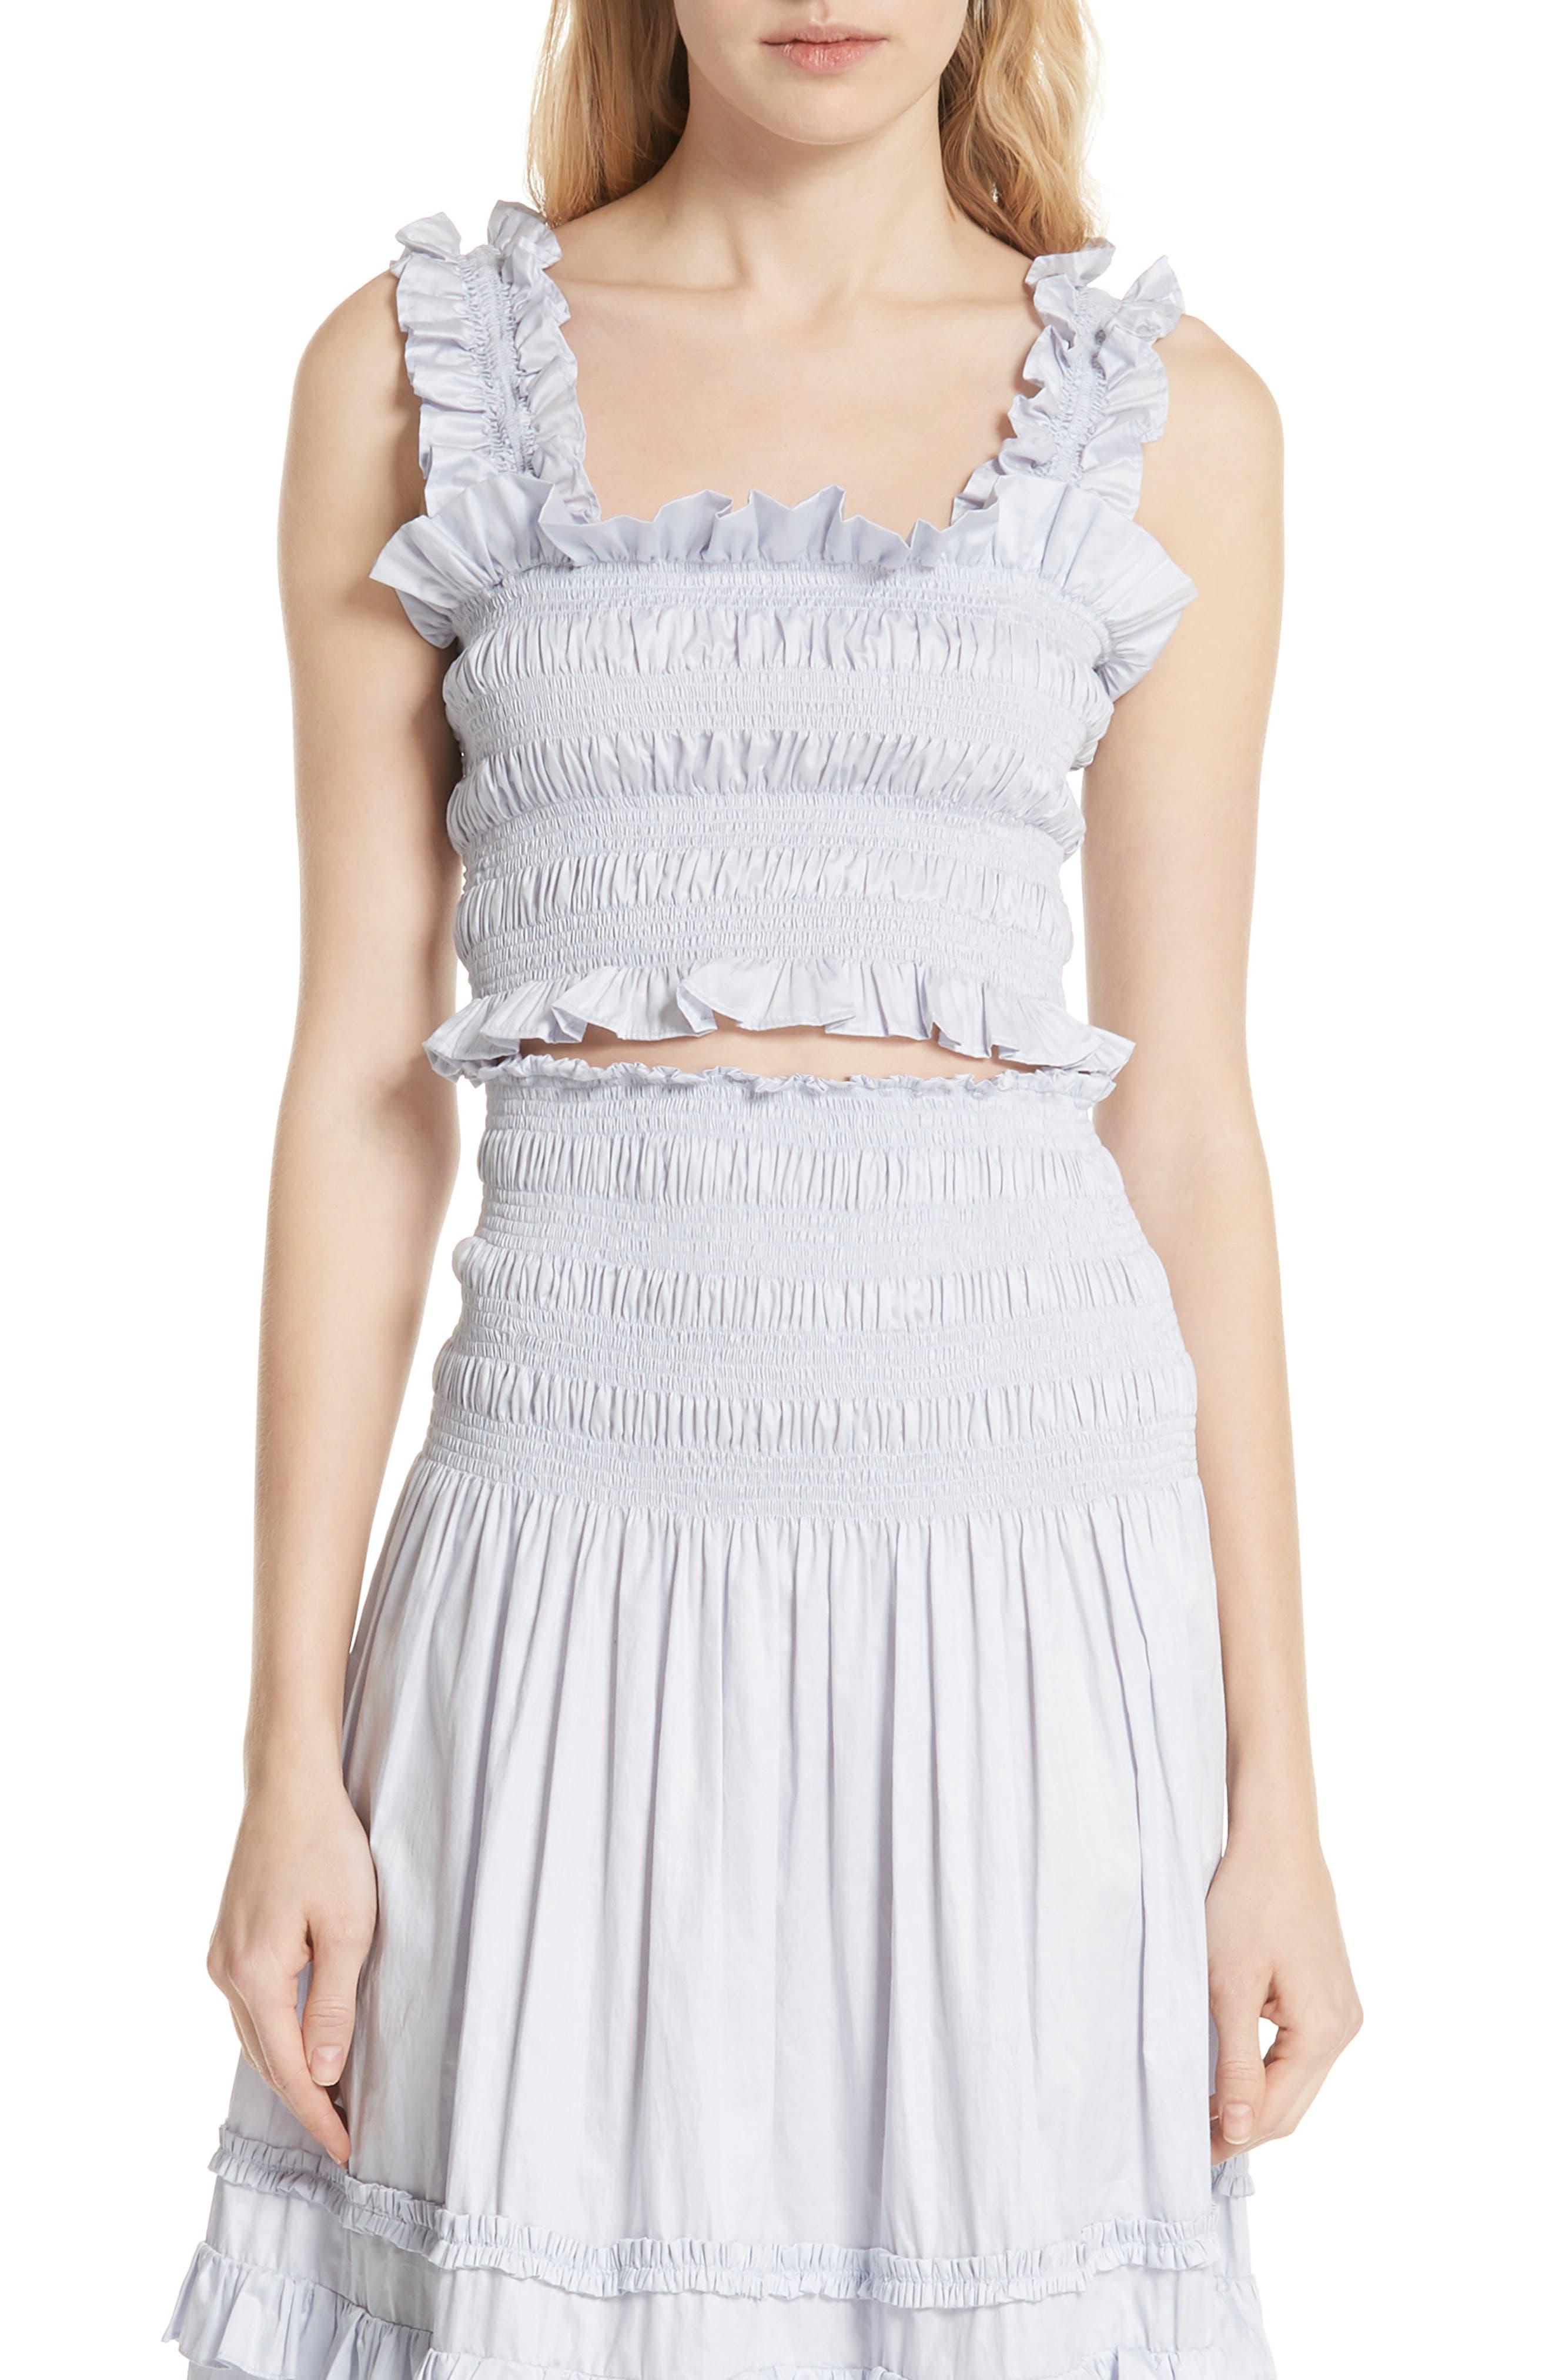 REBECCA TAYLOR, Smocked Sleeveless Cotton Top, Main thumbnail 1, color, 458